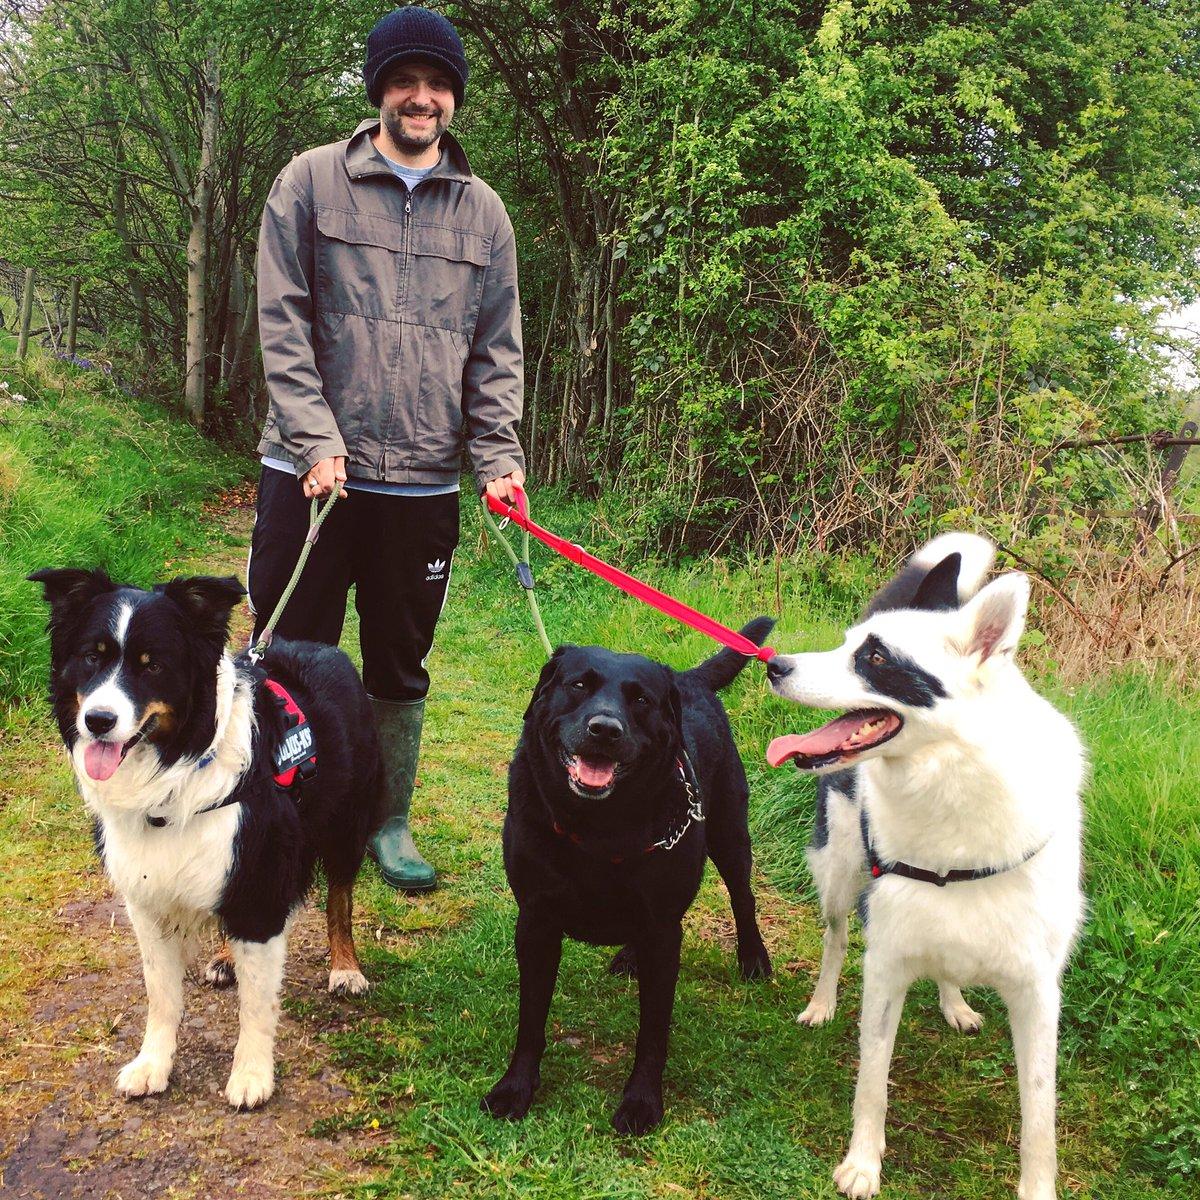 Massive Monday with the 3 Amigos: Bandi, Billy &amp; Maxie  #Husky #collie #blacklab #threeamigos #walkies #maxie #bandi #billy #dansdogdaycare<br>http://pic.twitter.com/f1lVh6TNMB